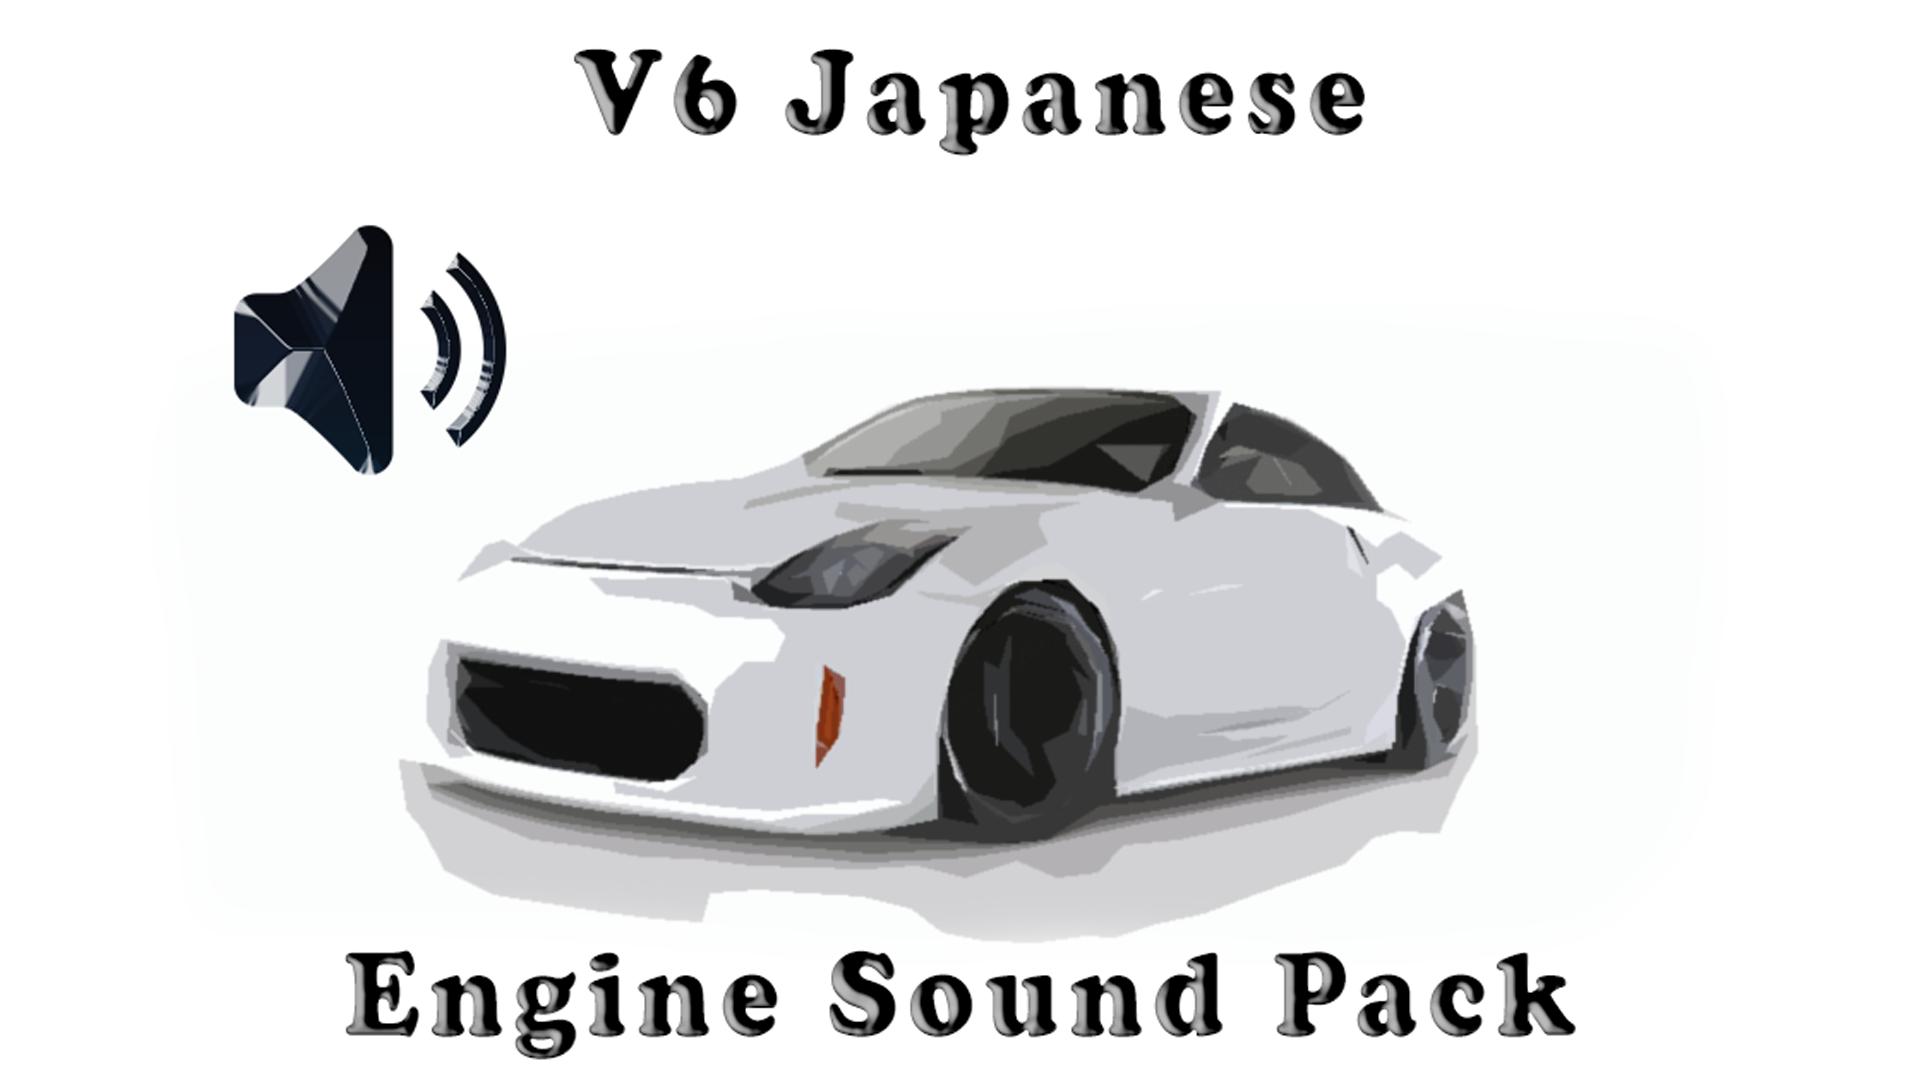 V6 Japanese Engine Sound Packs by Yugel Mobile - Skril Studio in